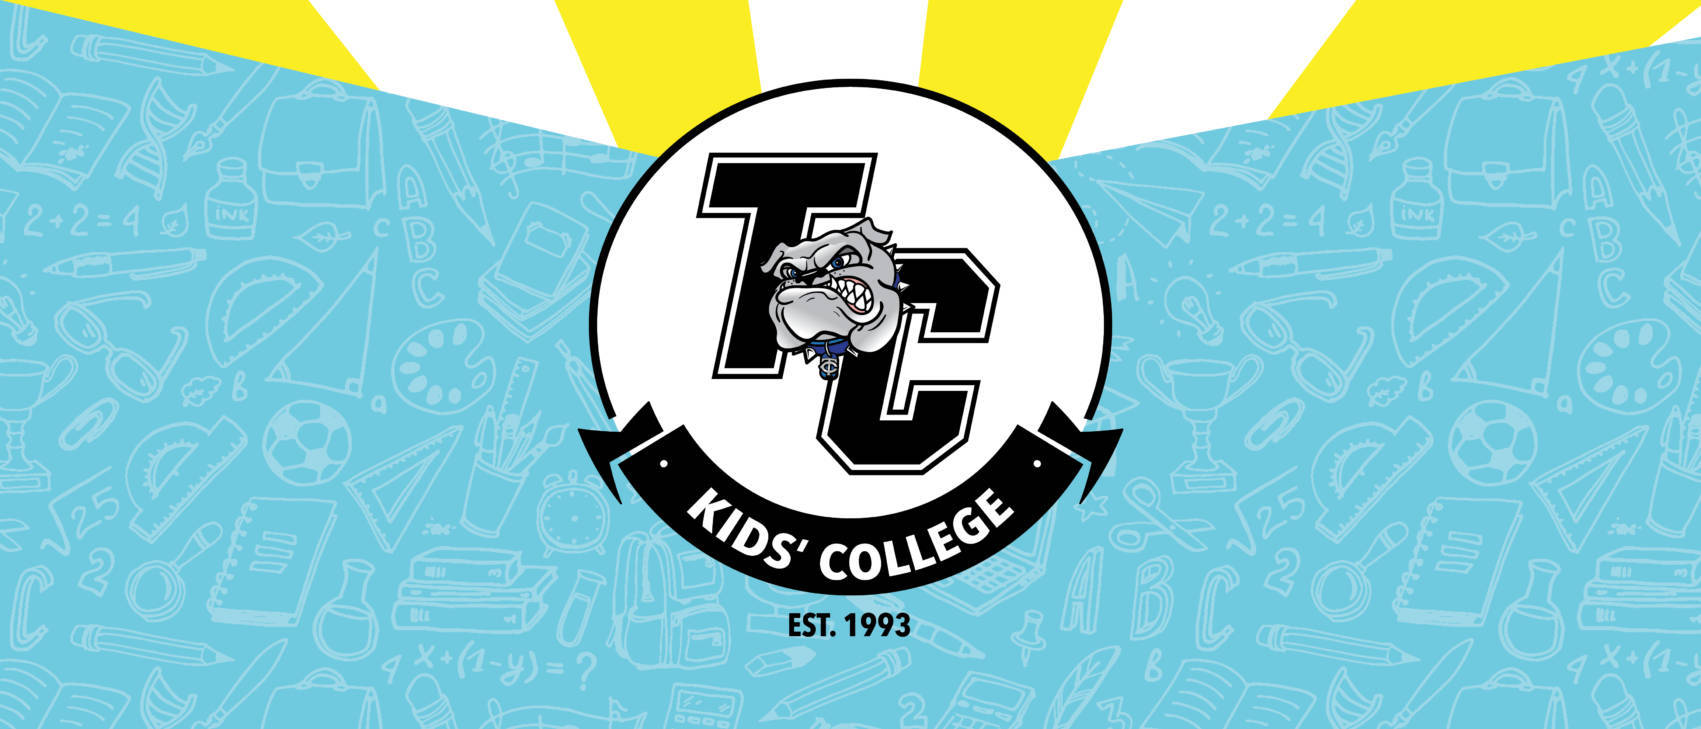 Kids' College